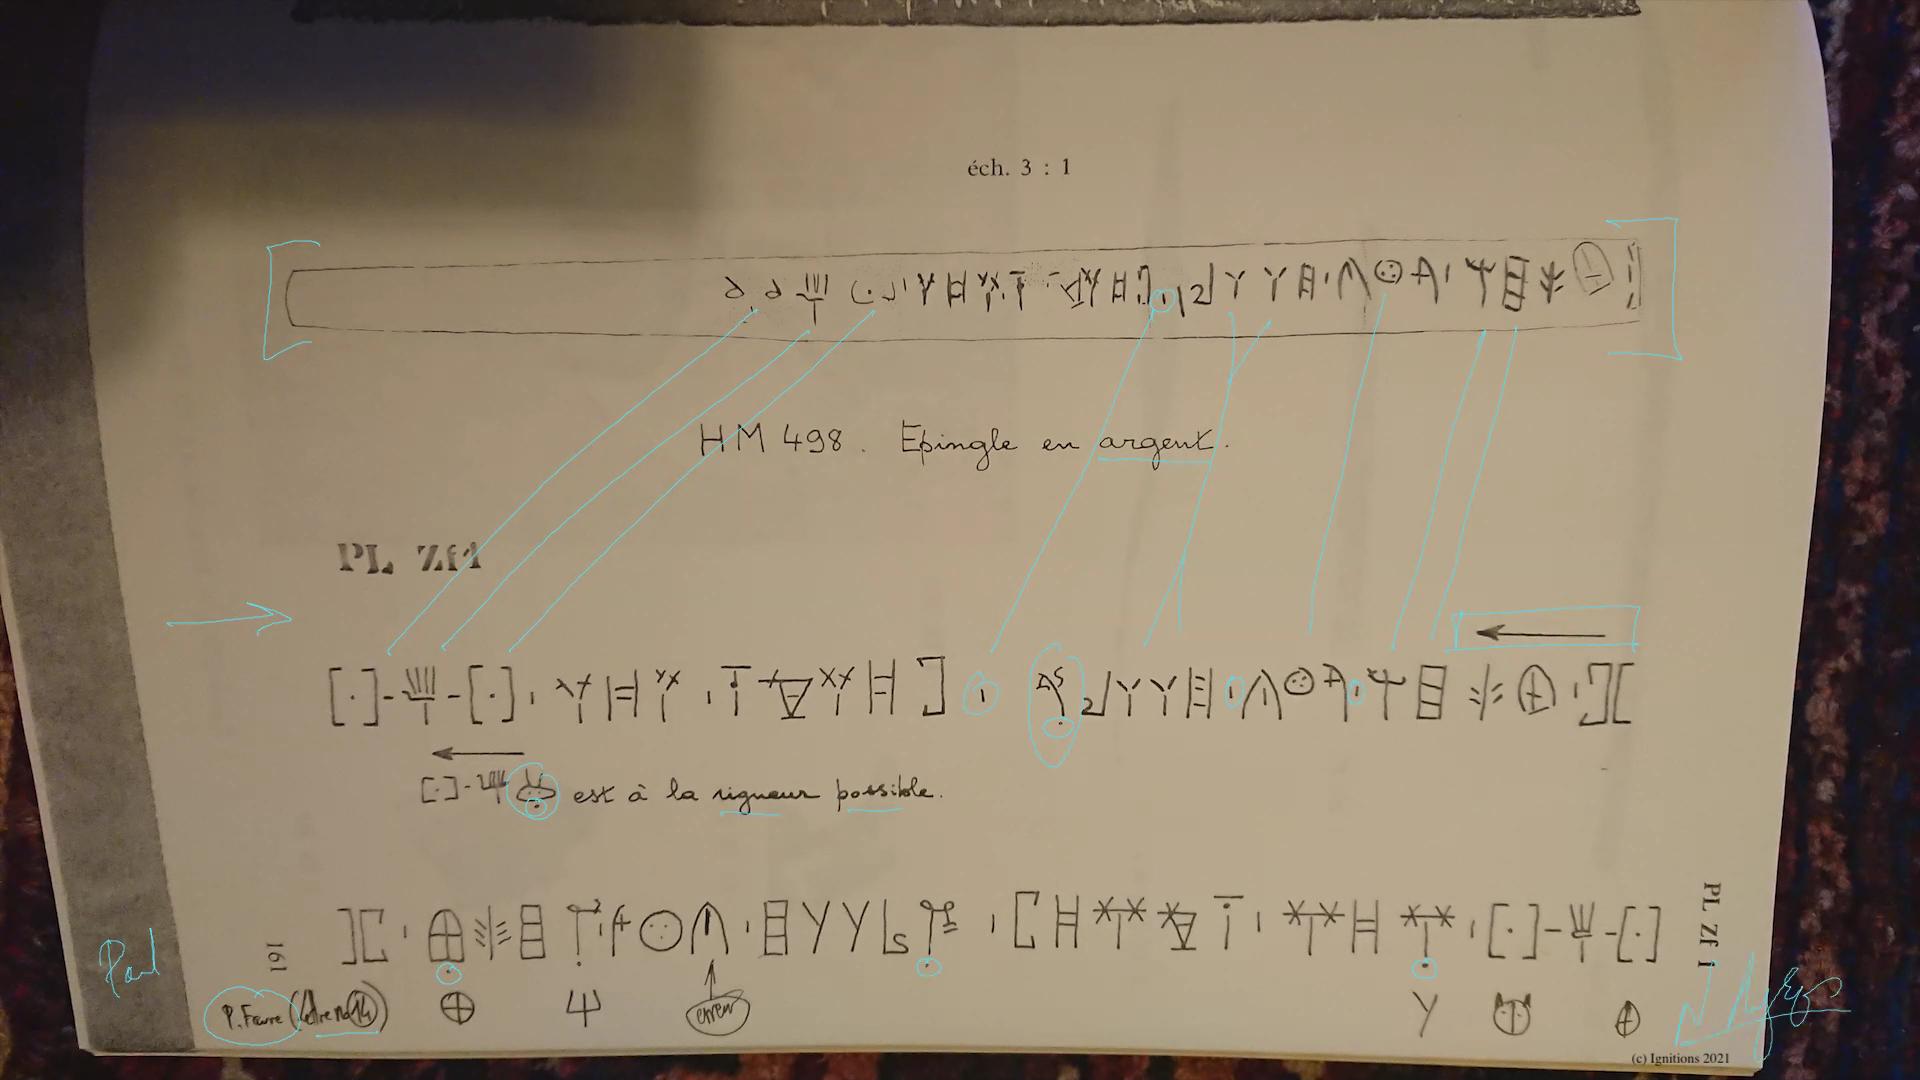 59395 - XV - e-Masterclass: Τεχνικές Αποκρυπτογράφησης. (Dessin)